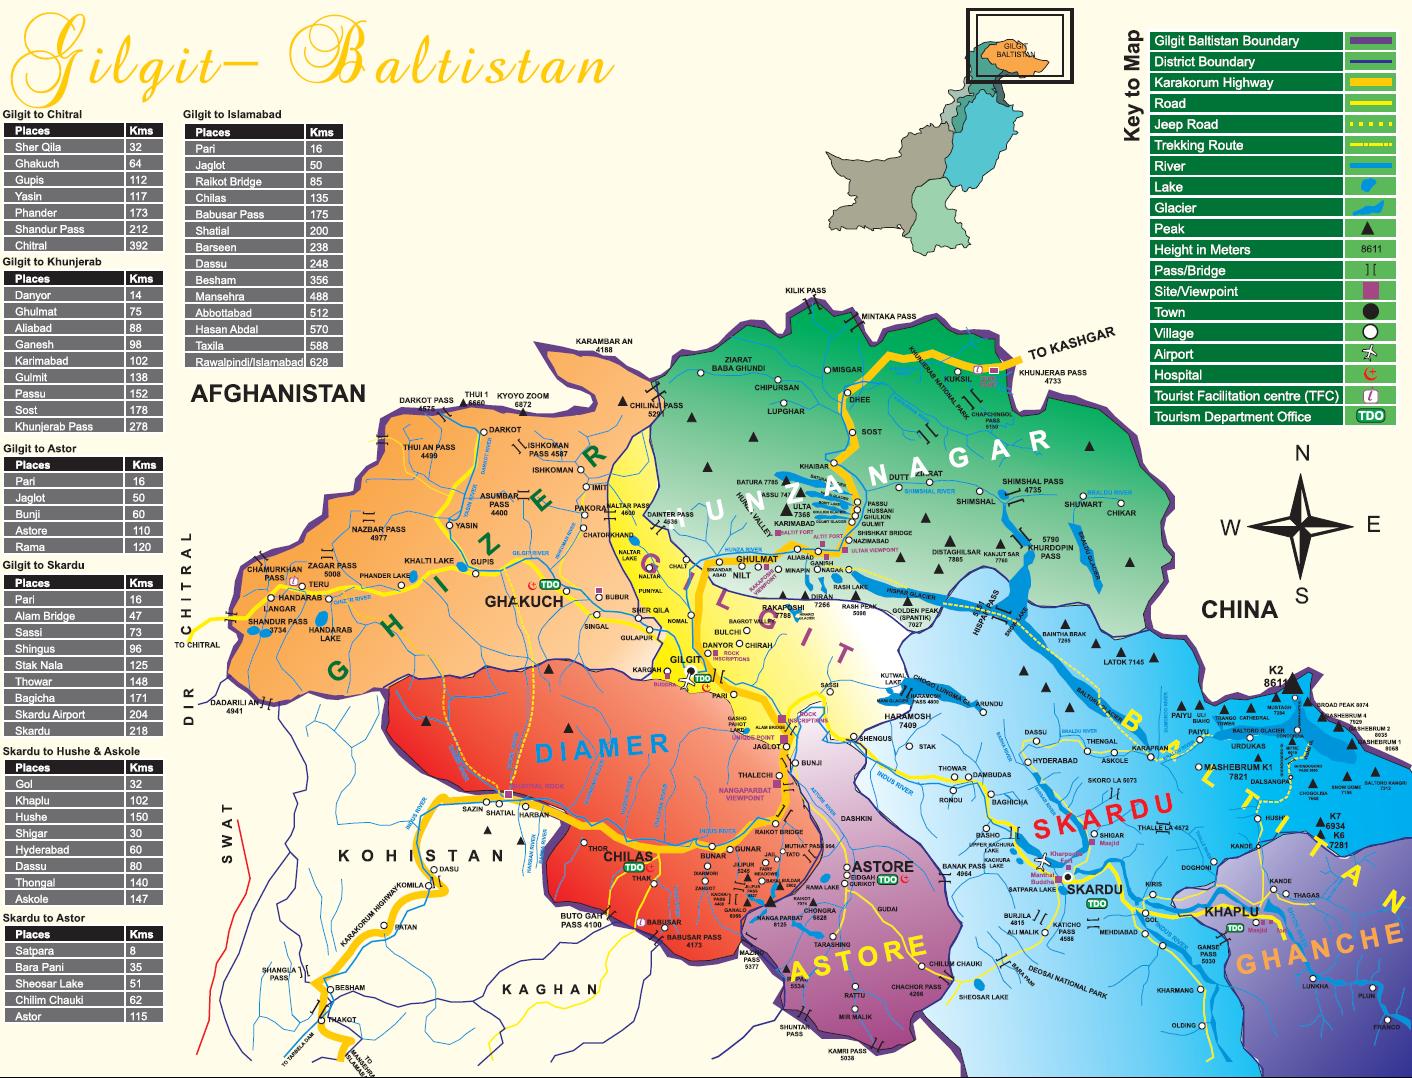 Hunza Adventure Tours 174 About Gilgit Baltistan